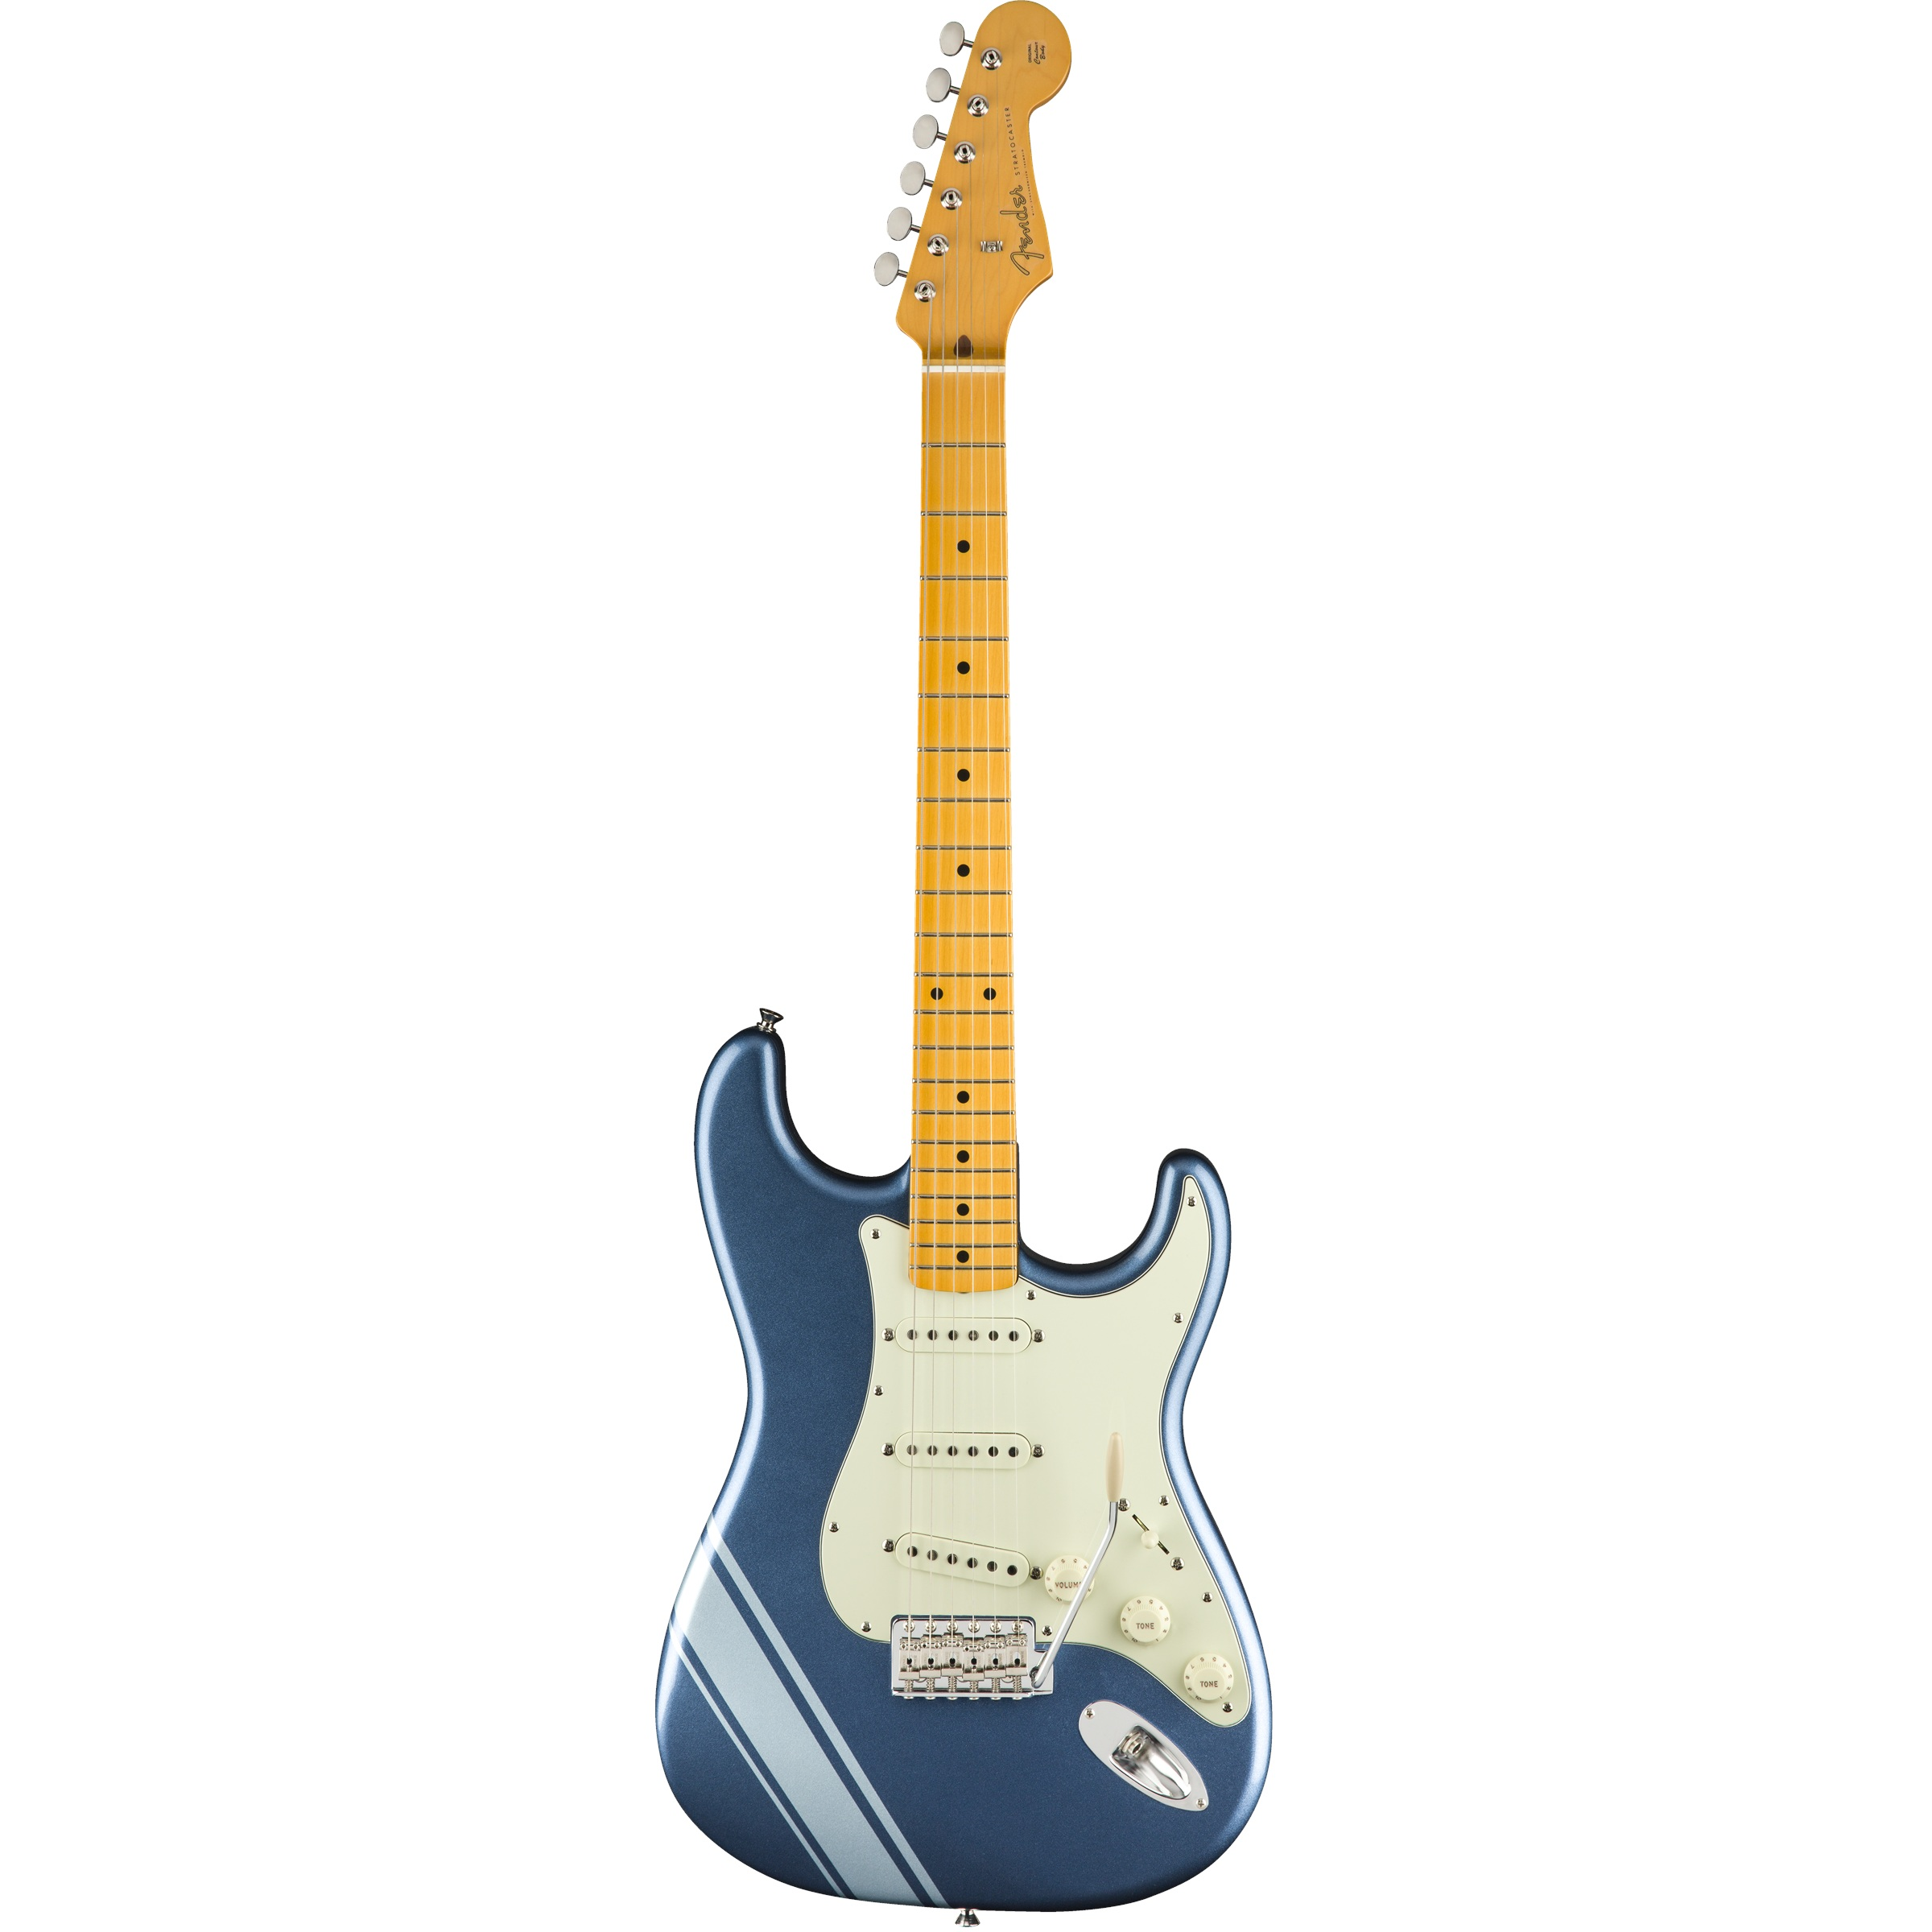 Fender FSR 50s Strat Lake Placid Blue with Stripe inklusive Tasche - B-Ware